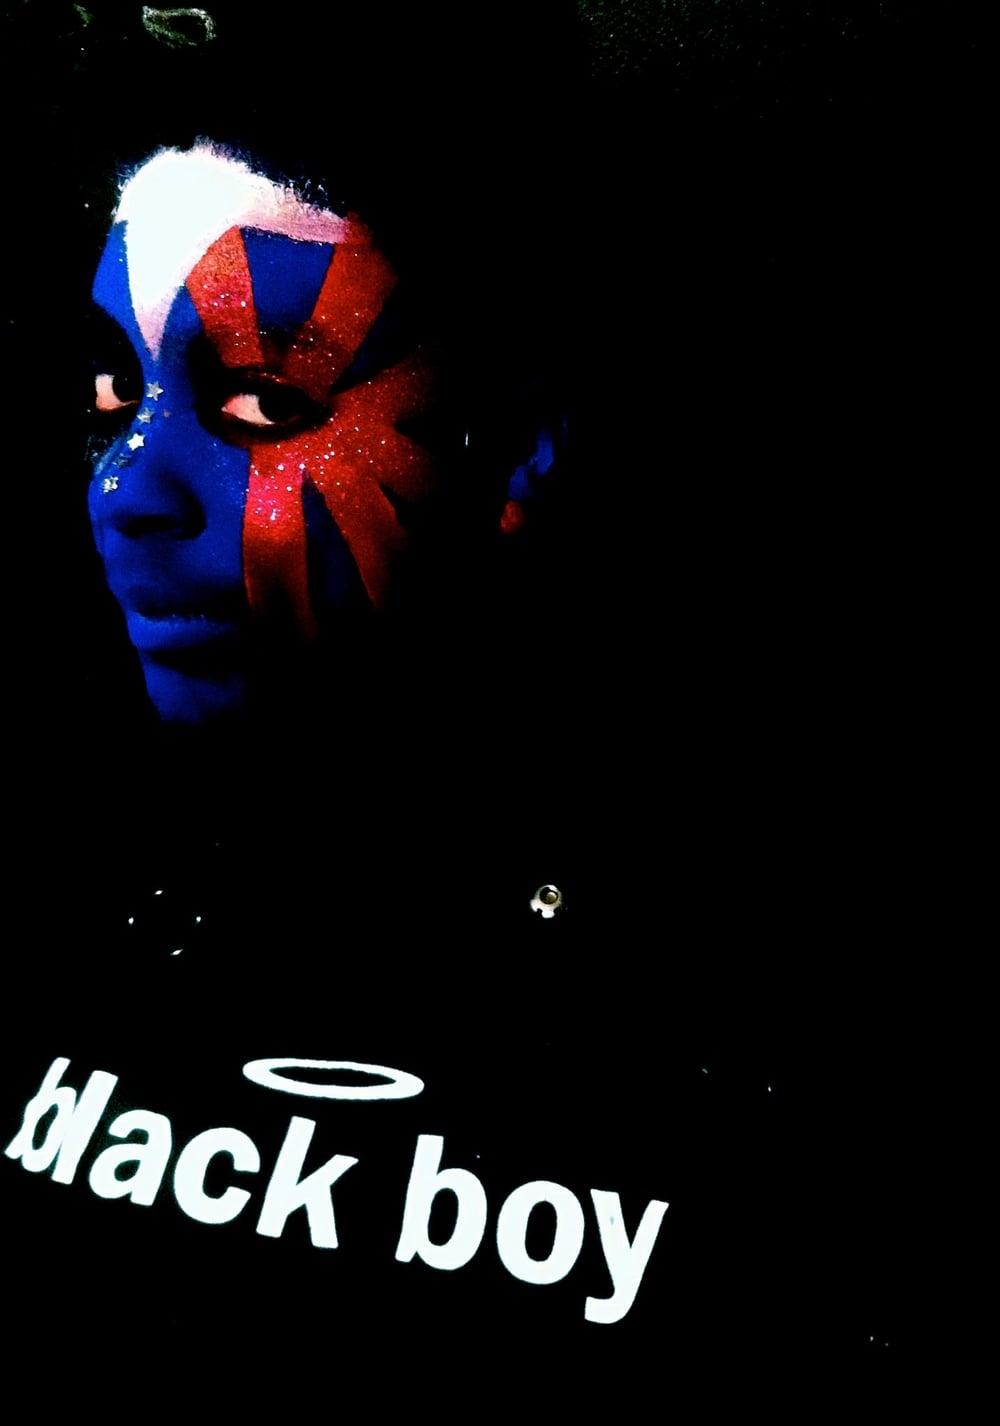 blackboy1.jpg